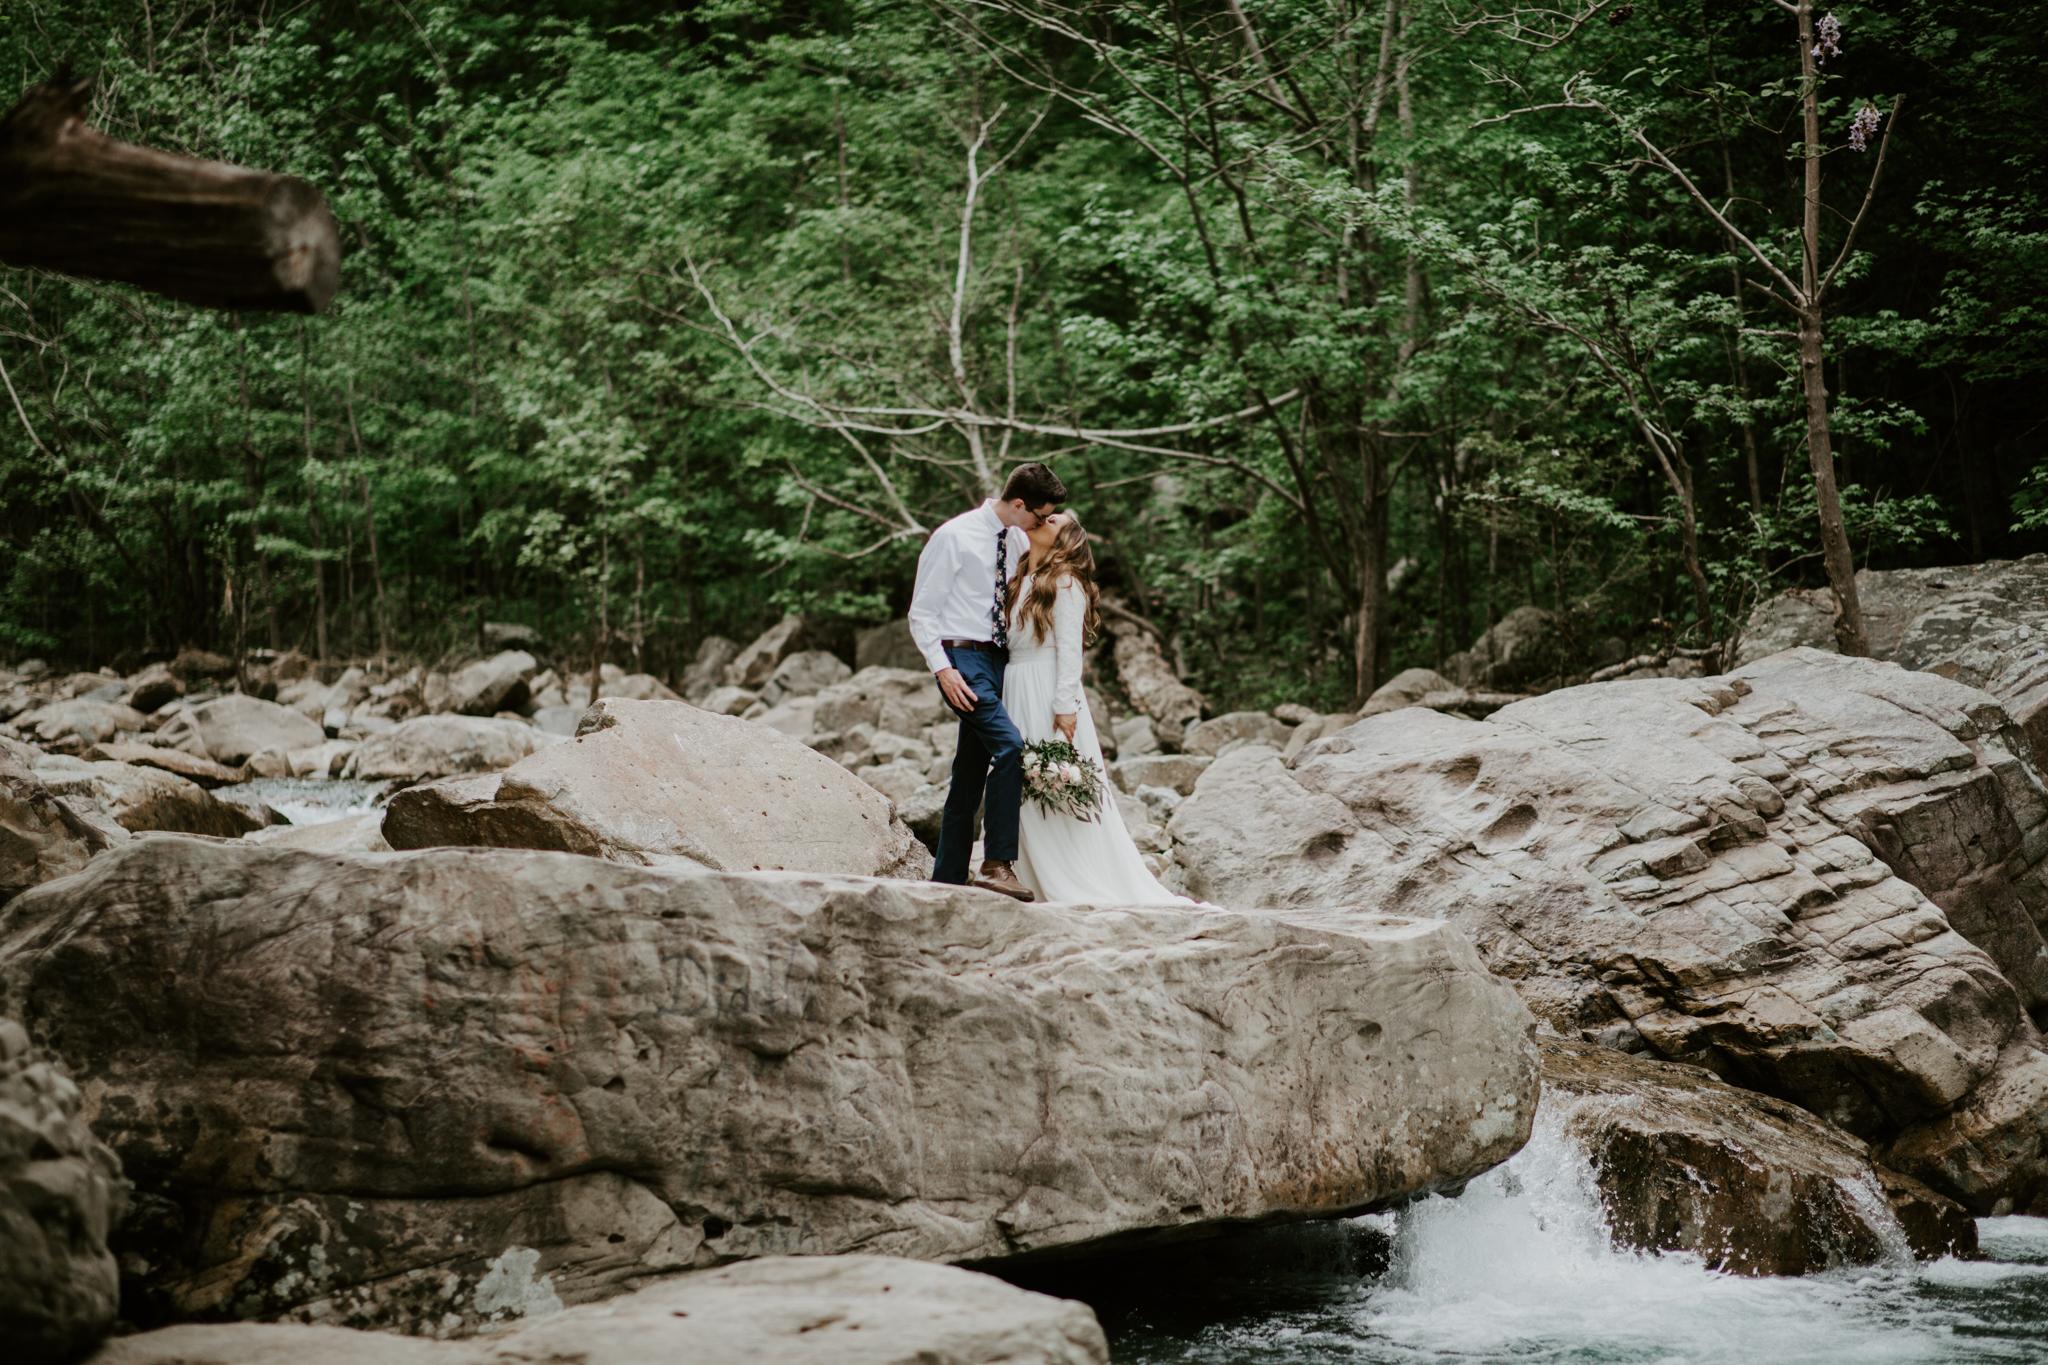 Lacey-Joe-Chattanooga-Nashville-Tennessee-Wedding-Elopement-Photographer-206.jpg